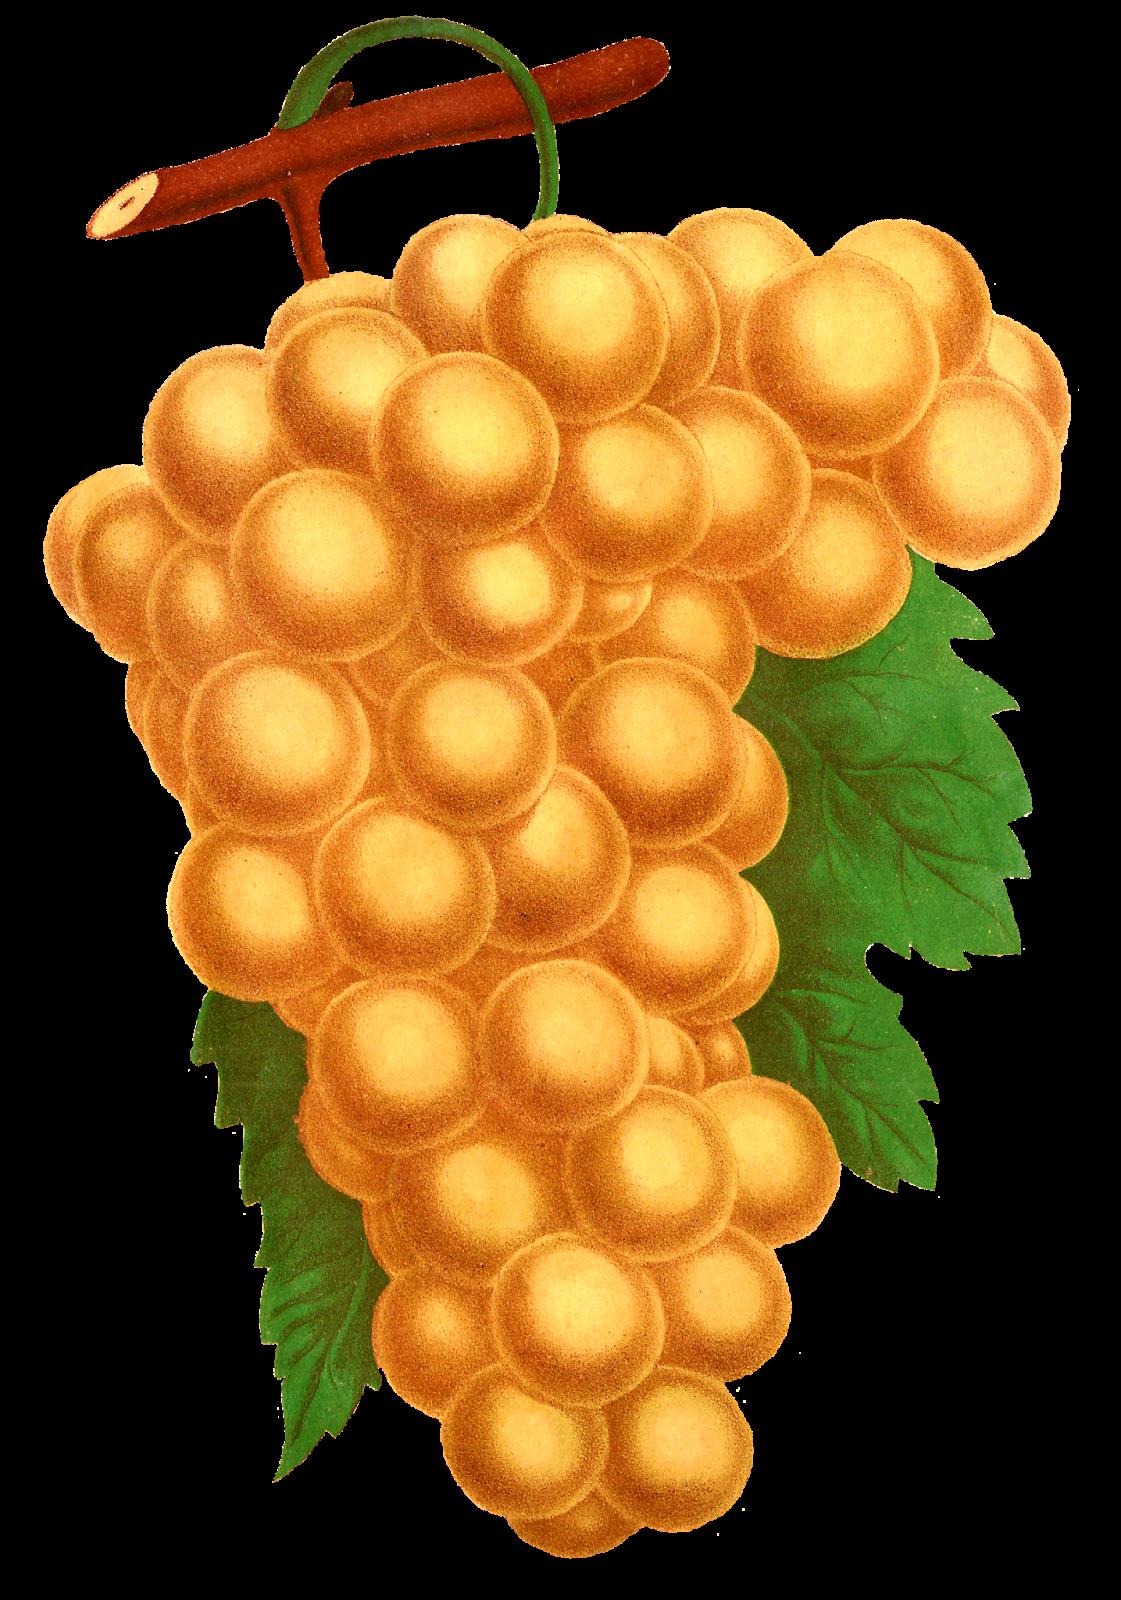 Grapes clipart illustration. Antique images stock fruit